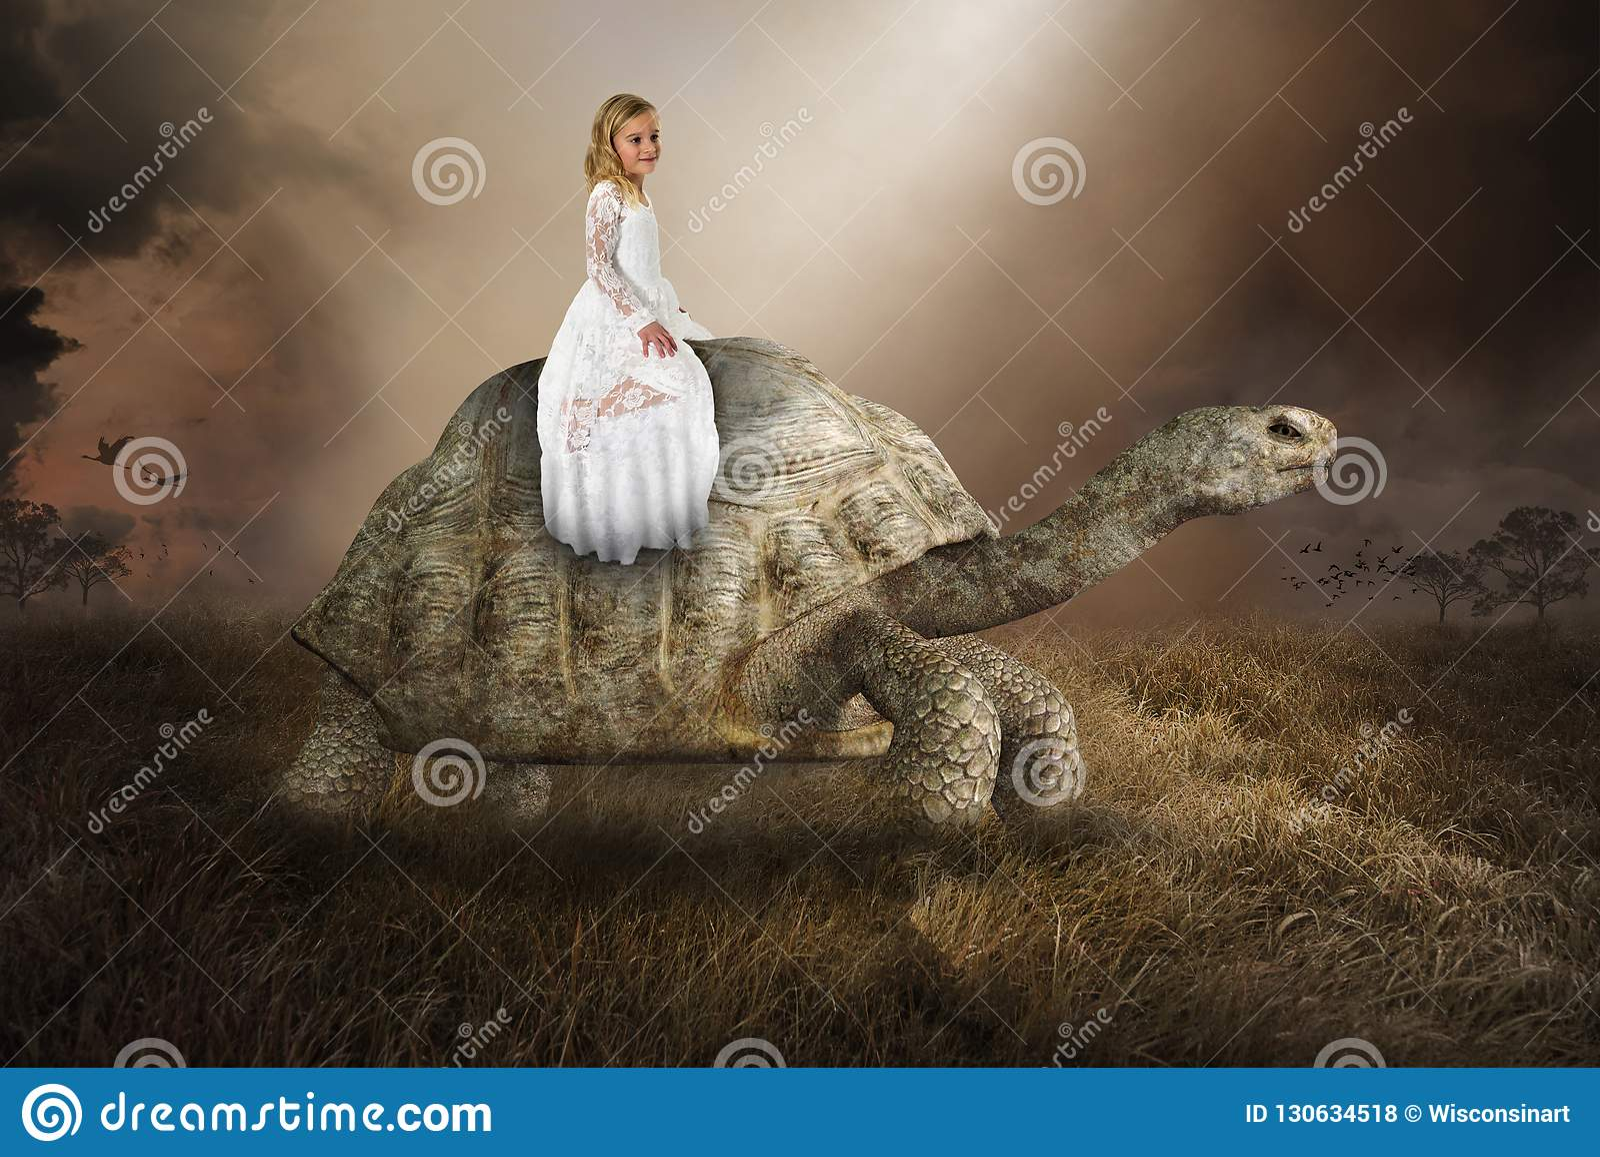 Surreal Girl, Turtle, Tortoise, Nature, Peace, Love